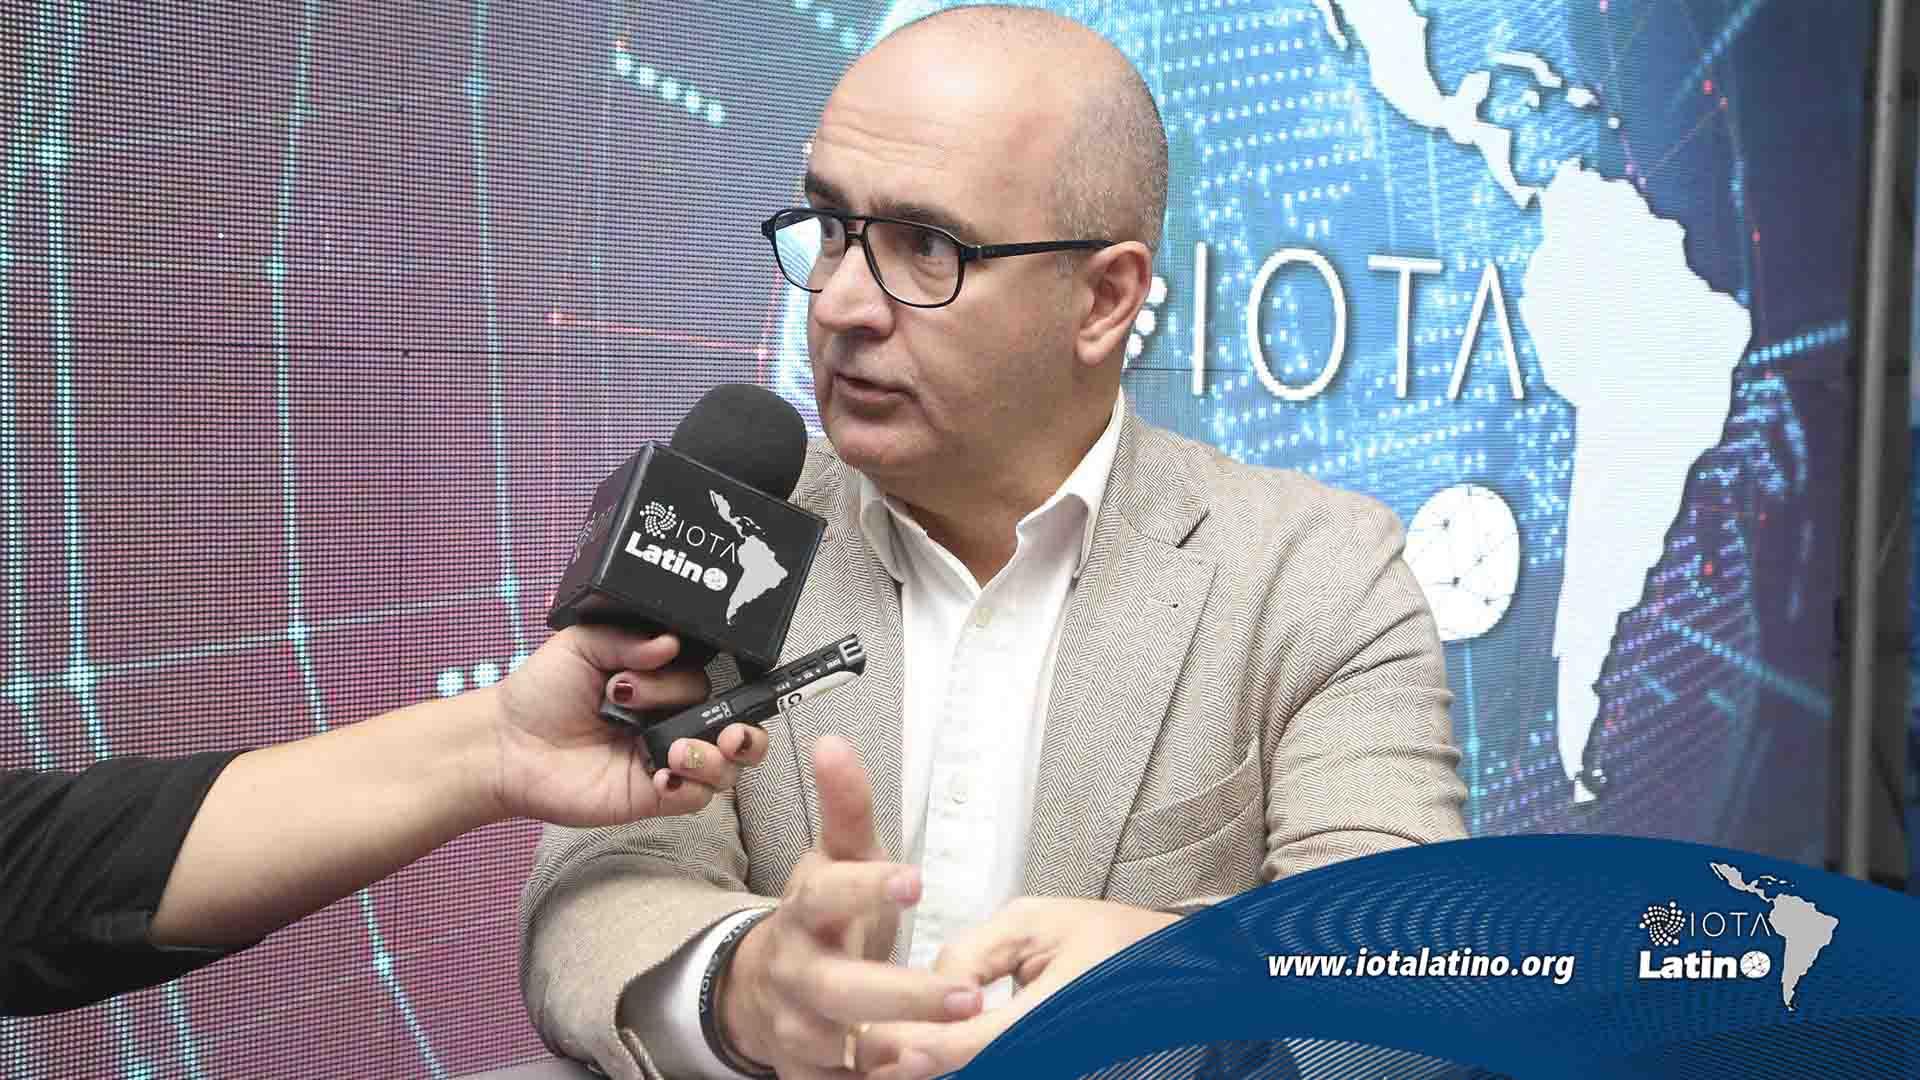 Saul Ameliach Iota Latino - tecnología Tangle - saul ameliach